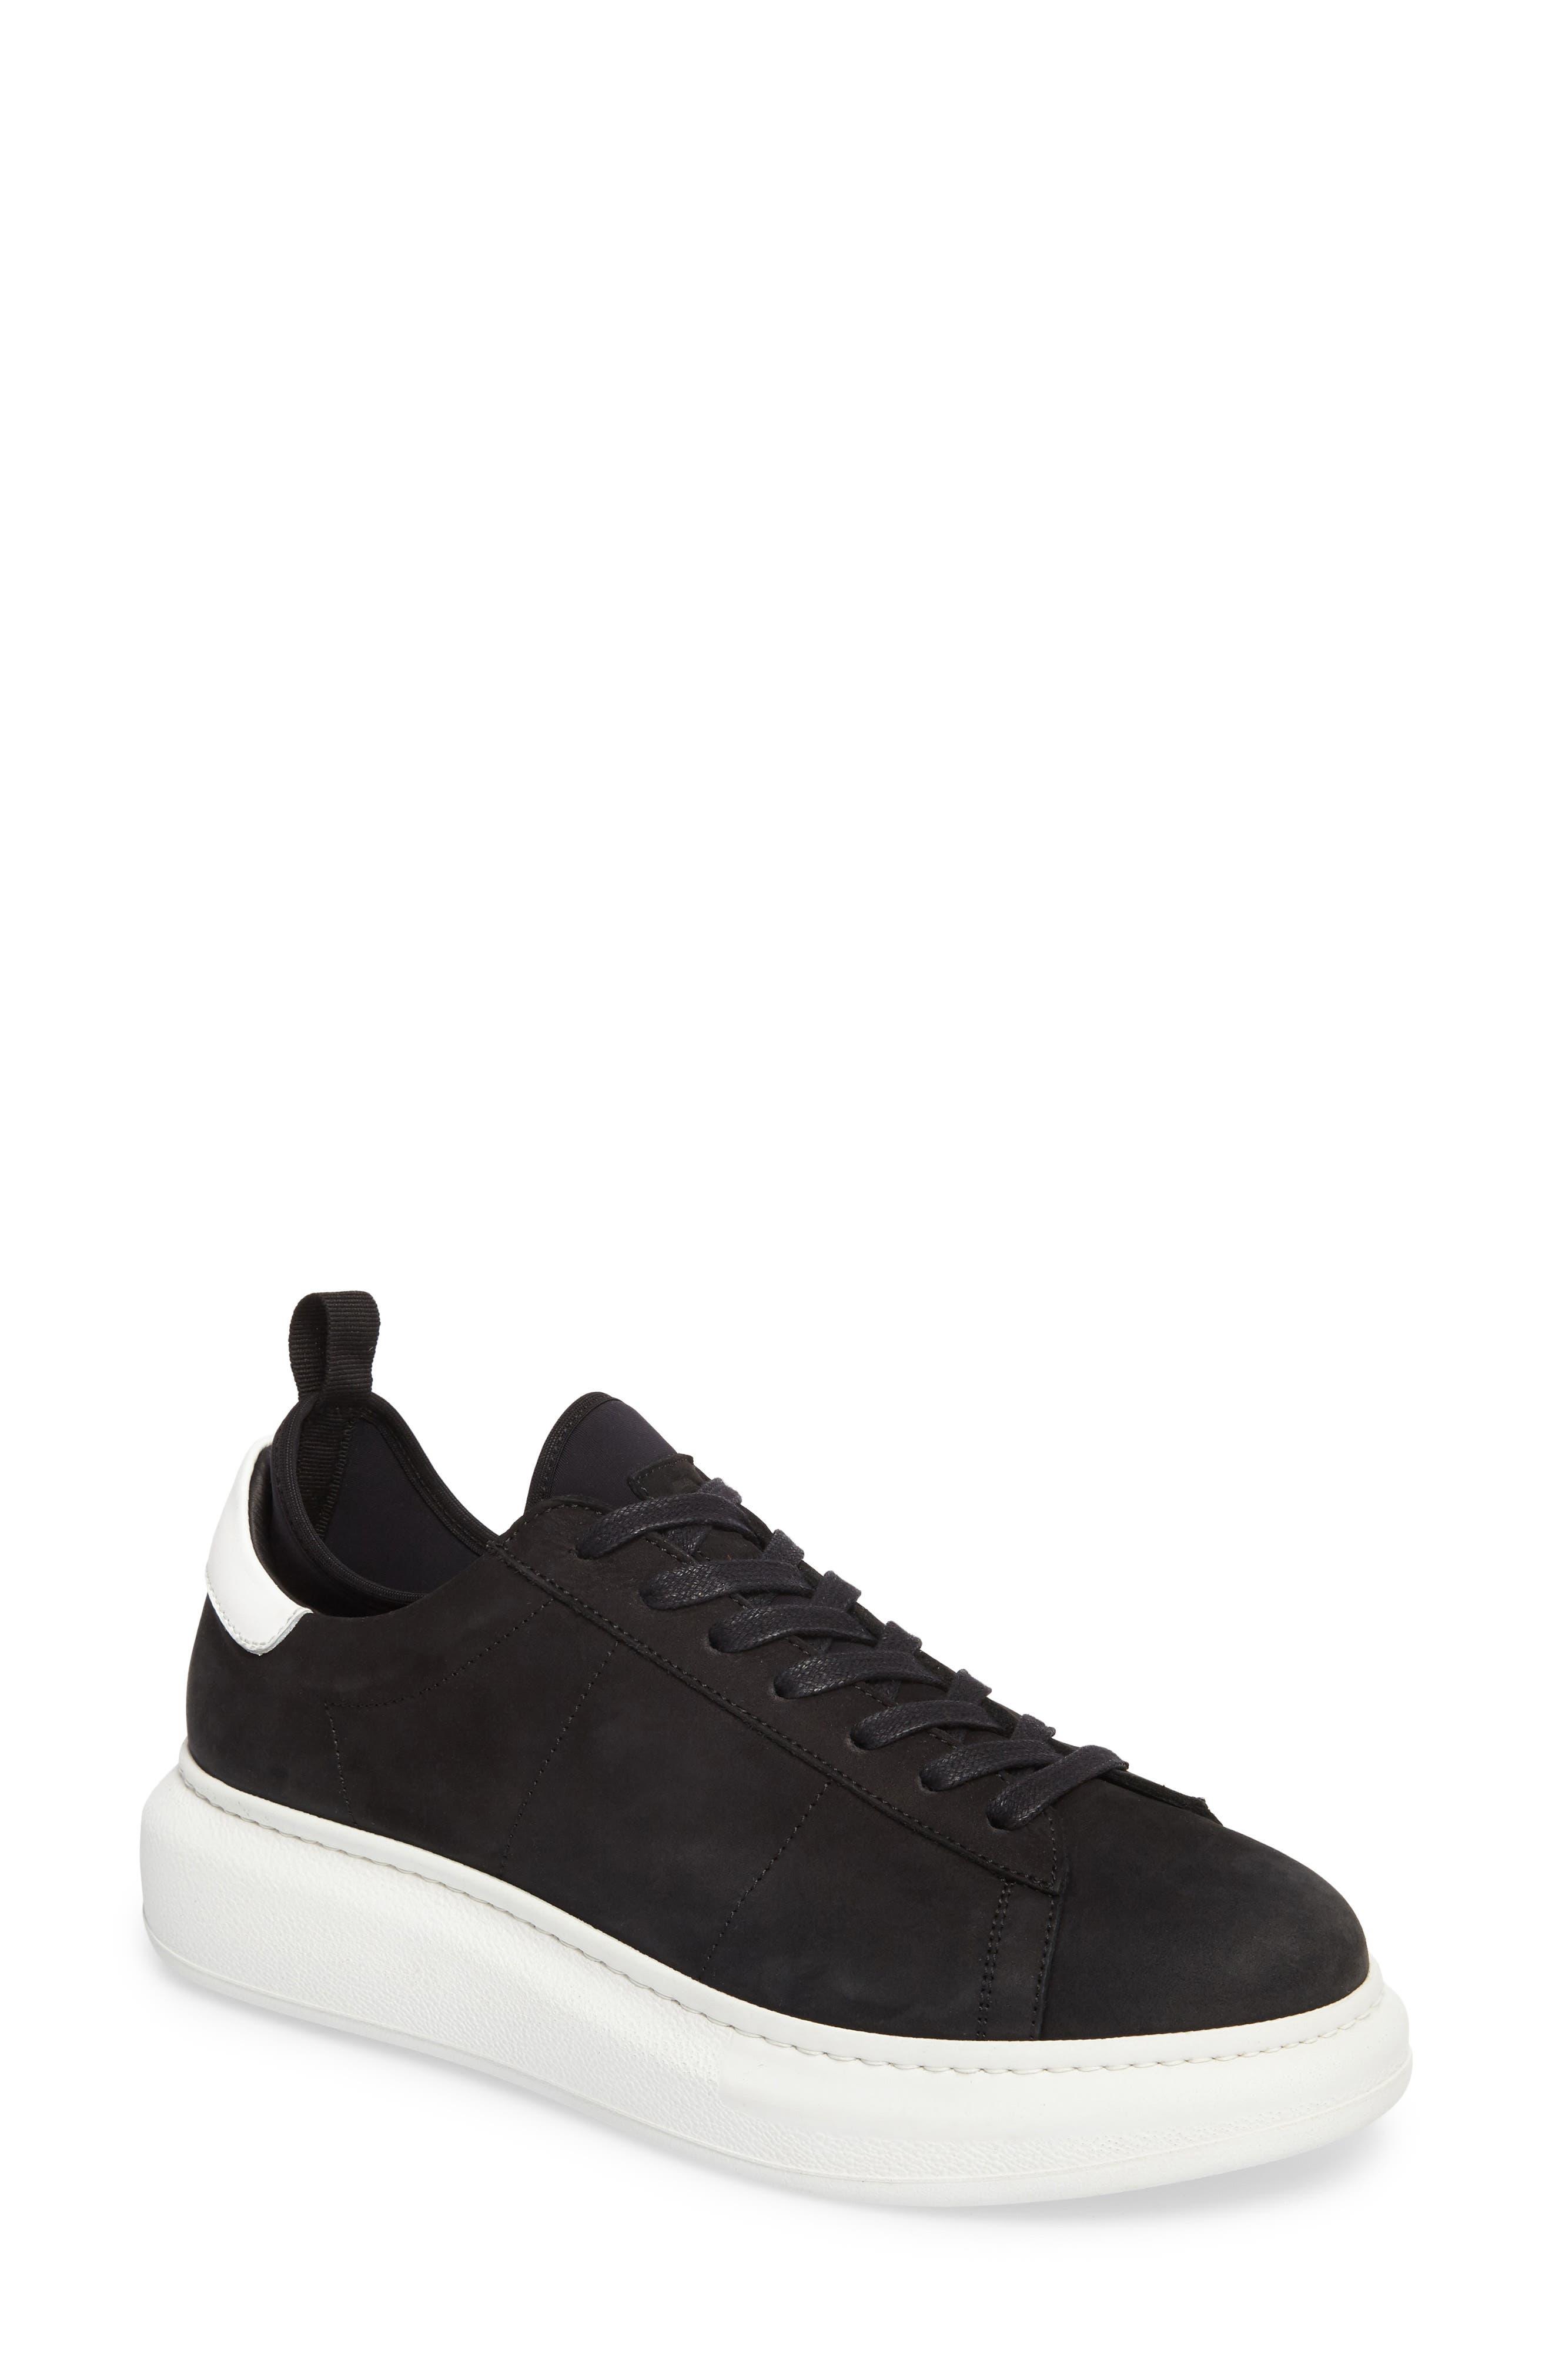 Alta Low Top Sneaker,                             Main thumbnail 1, color,                             BLACK NUBUCK LEATHER